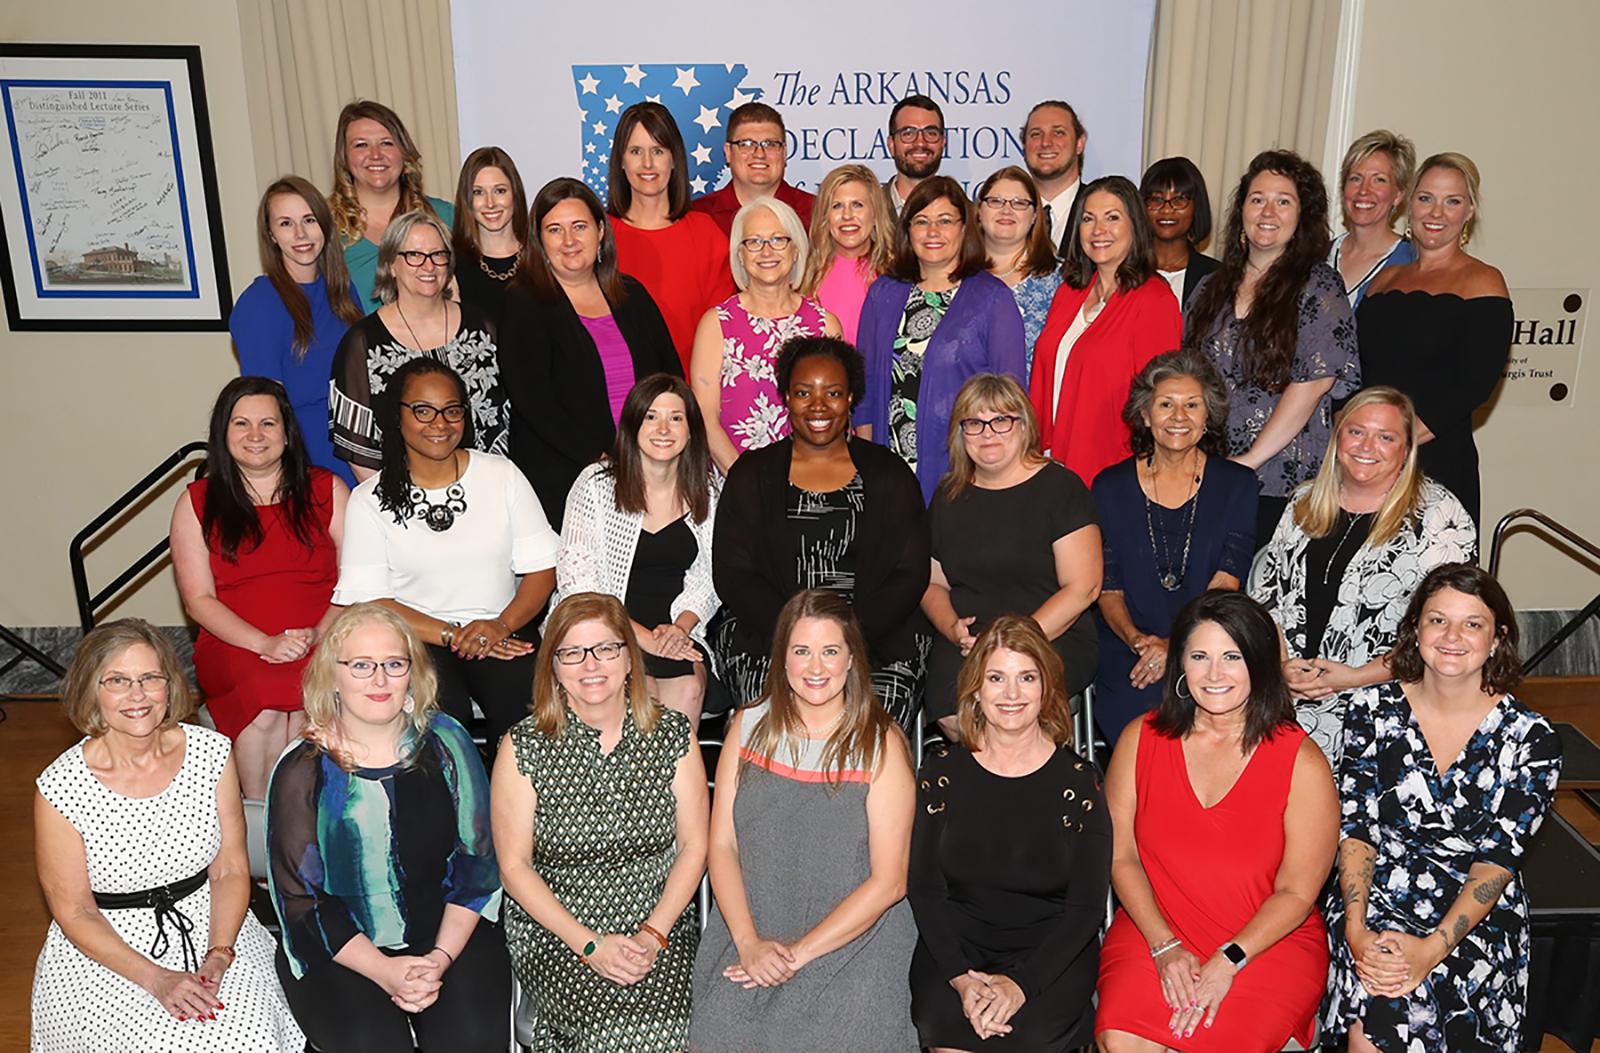 Arkansas Declaration of Learning Program participants